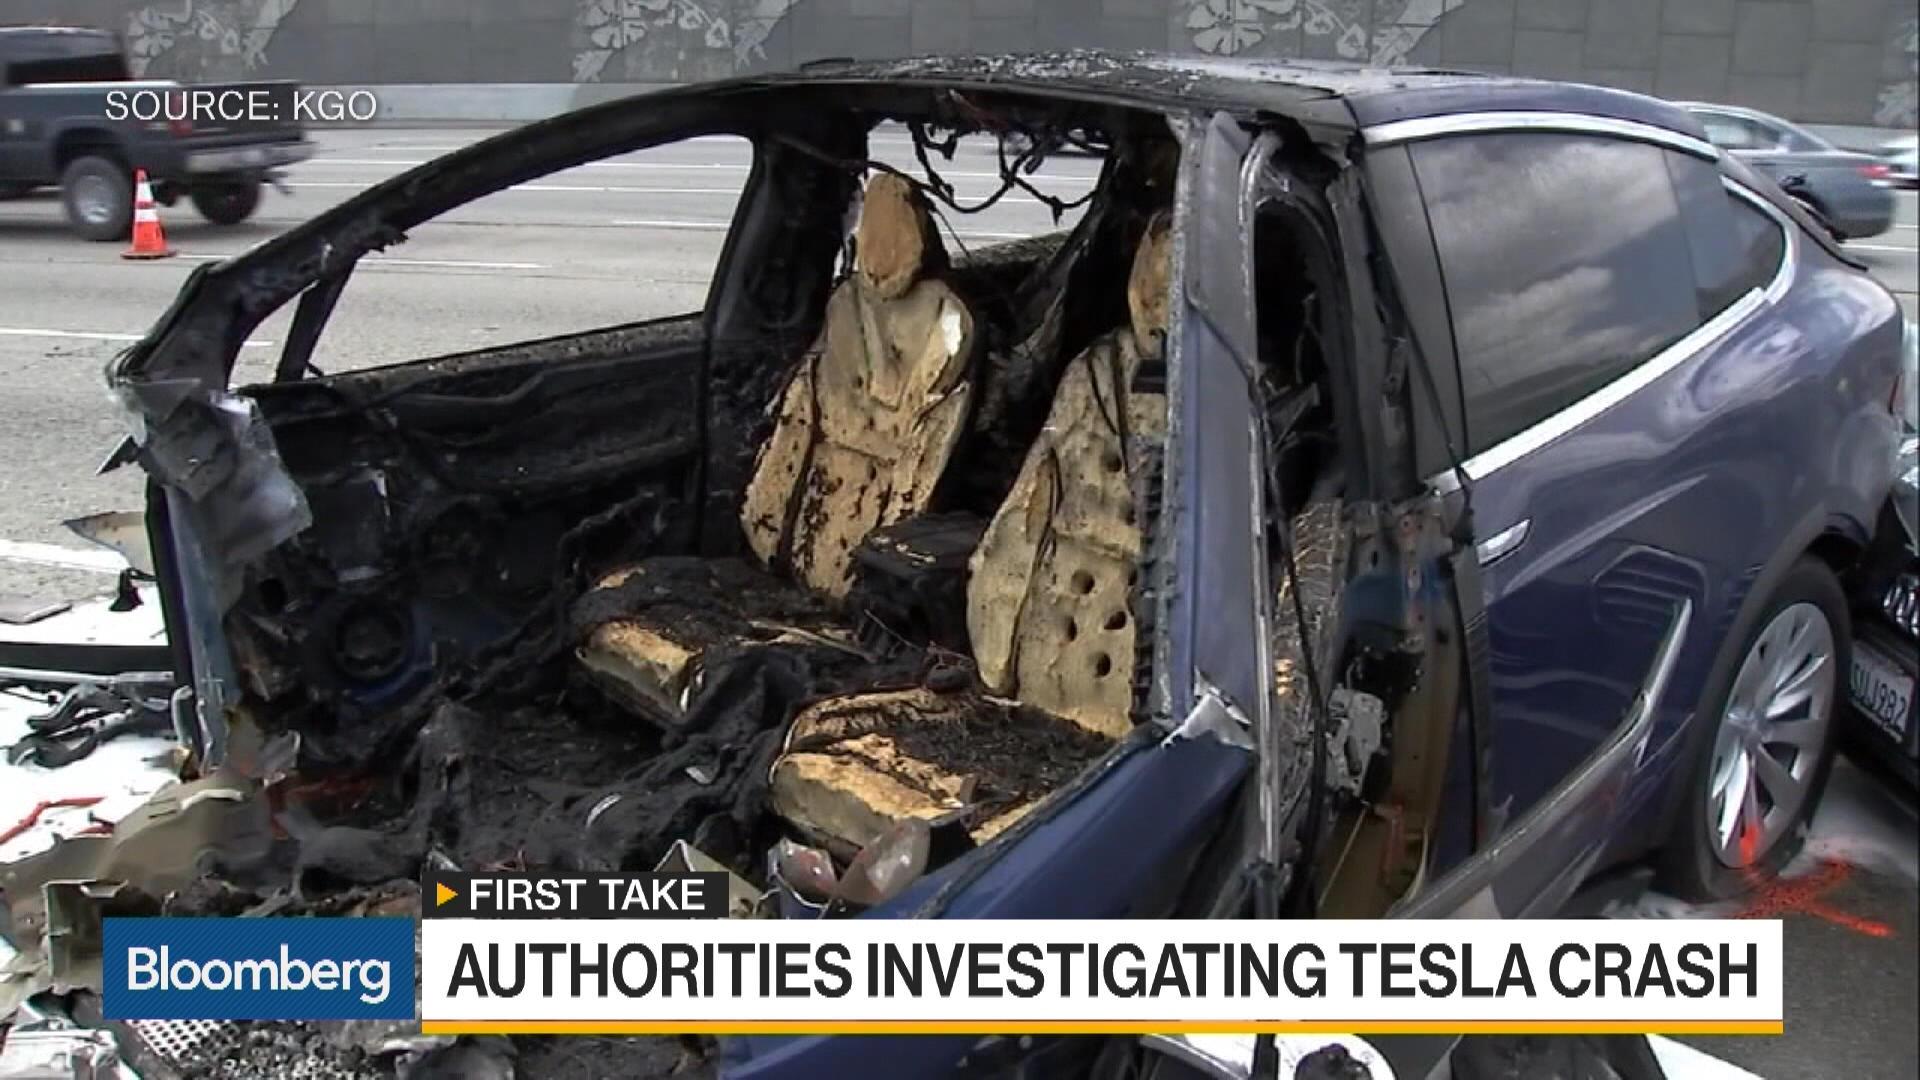 Tesla Unsure of Cause in Fatal Model X Crash – Bloomberg